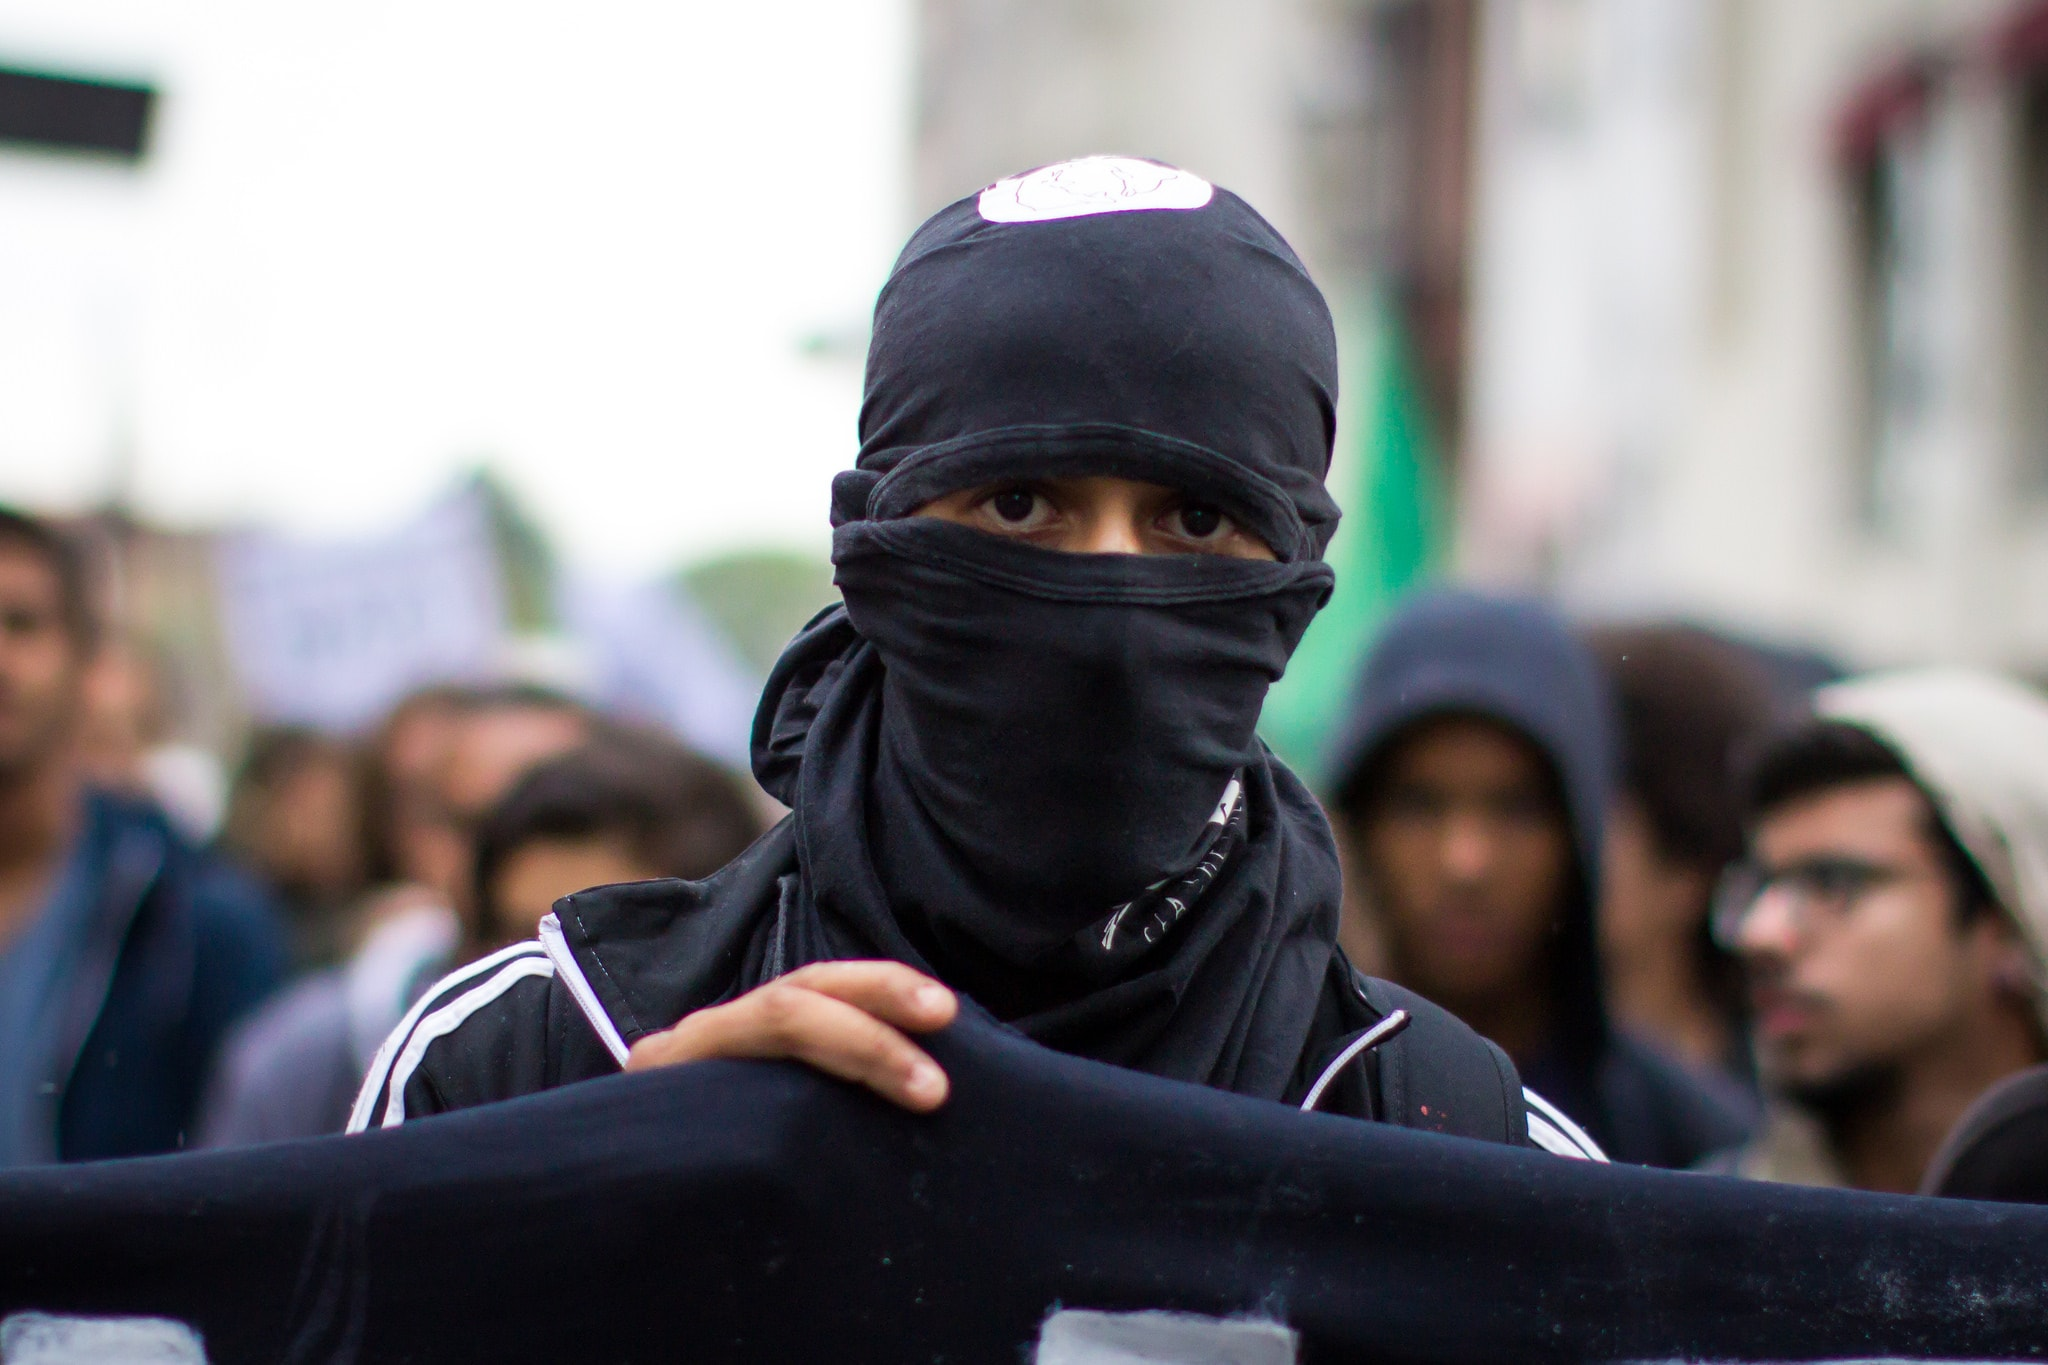 Neue Debatte - Beitrag - Protest - Widerstand - Foto - Romerito Pontes - flickr.com - CC BY 2.0